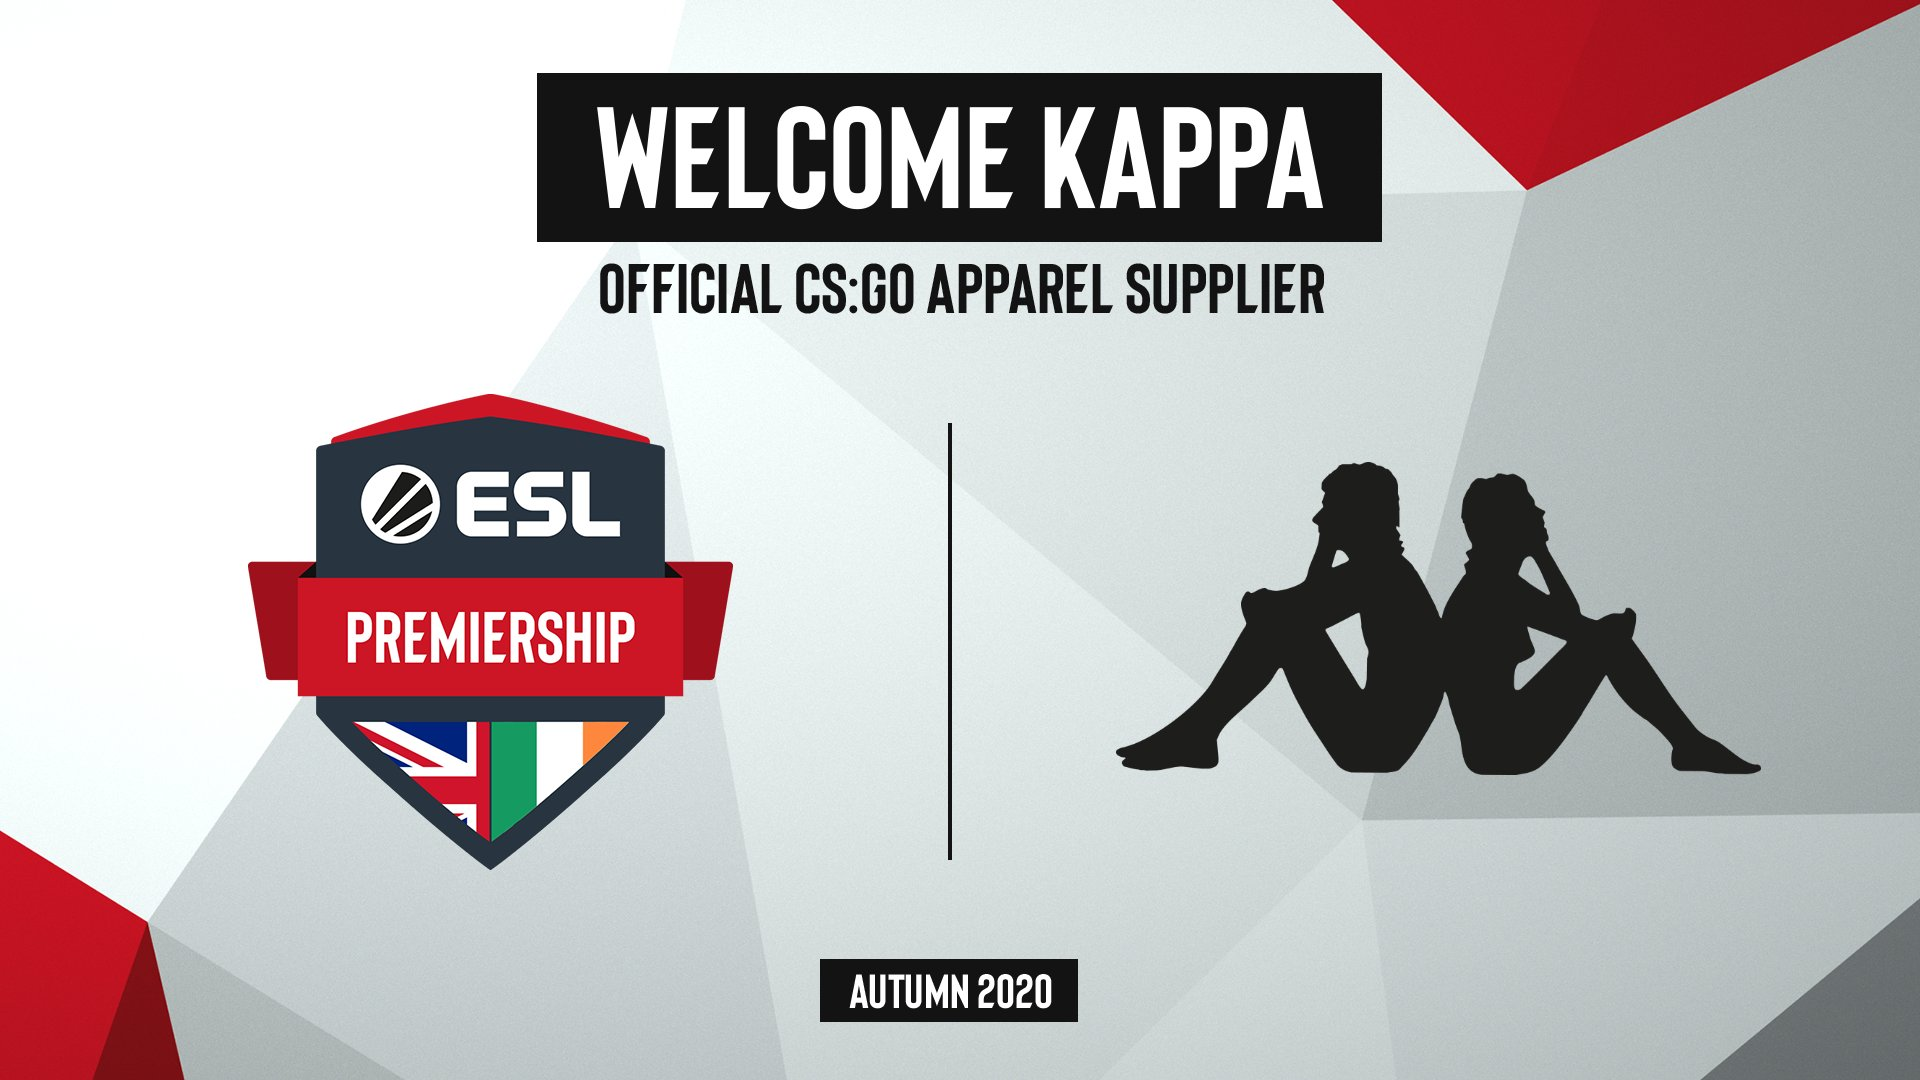 KAPPA ENTERS THE ESL PREMIERSHIP AS A SUPPLIER PARTNER